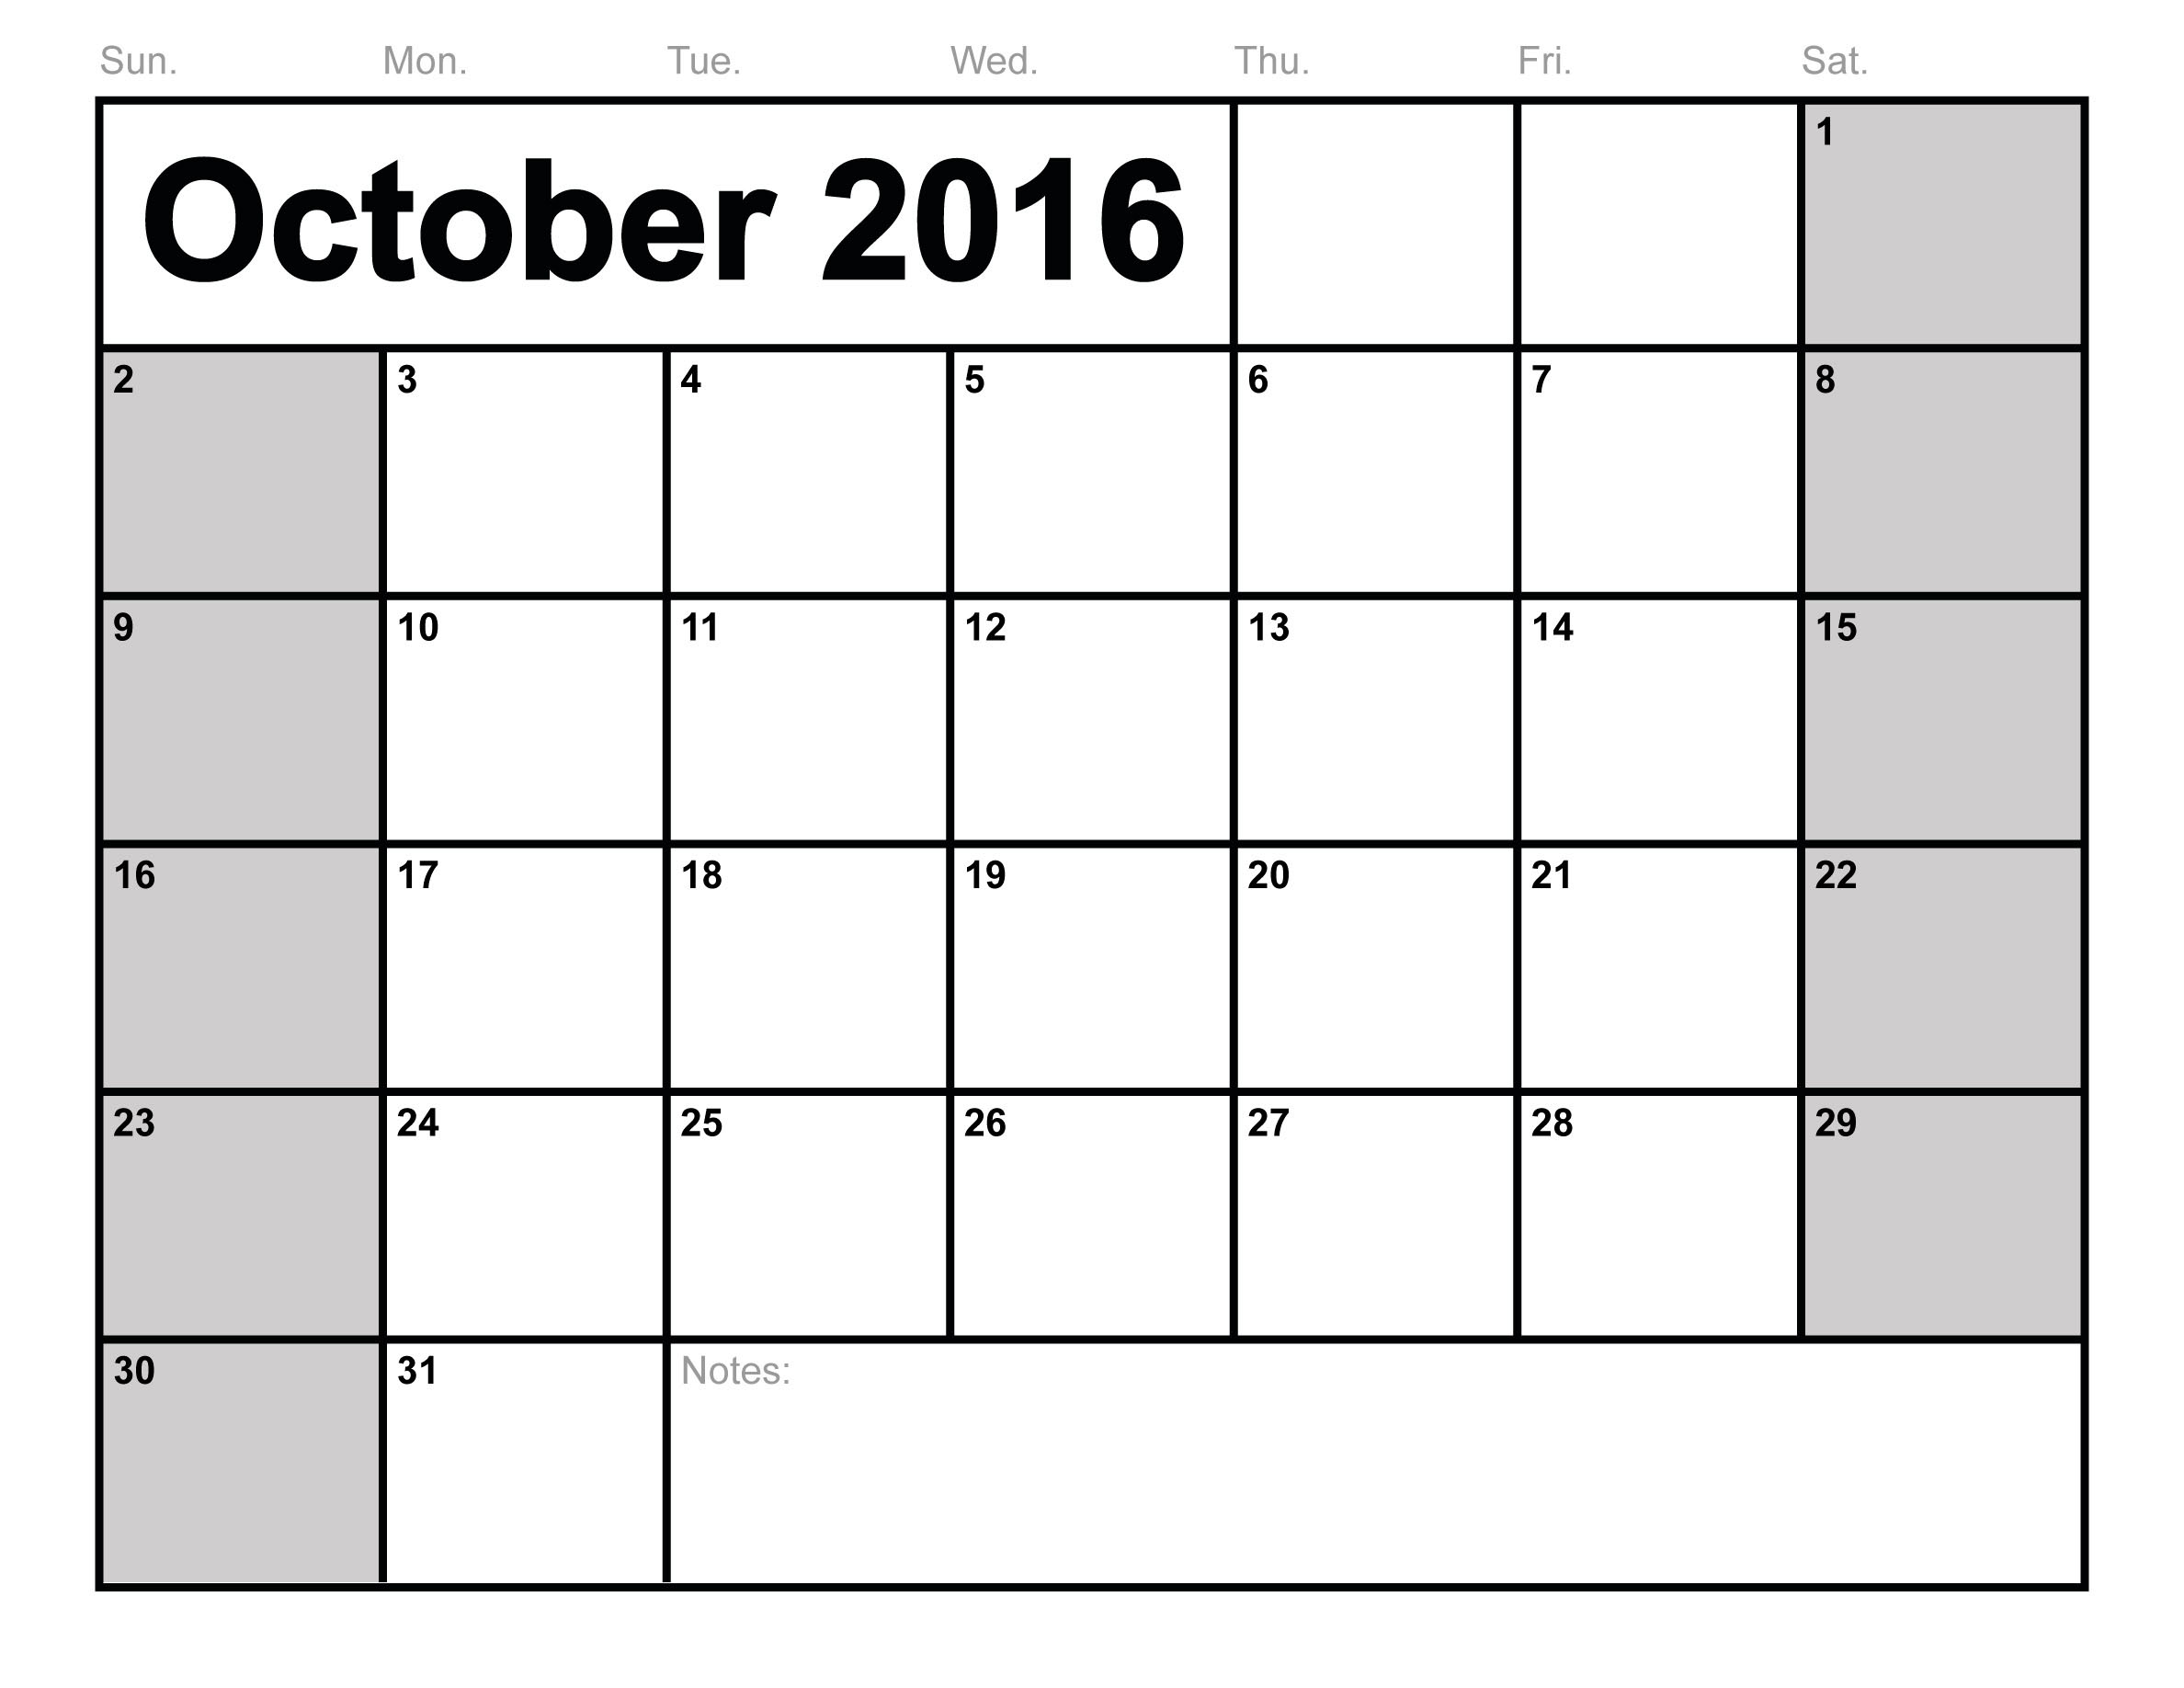 October 2016 Calendar PDF